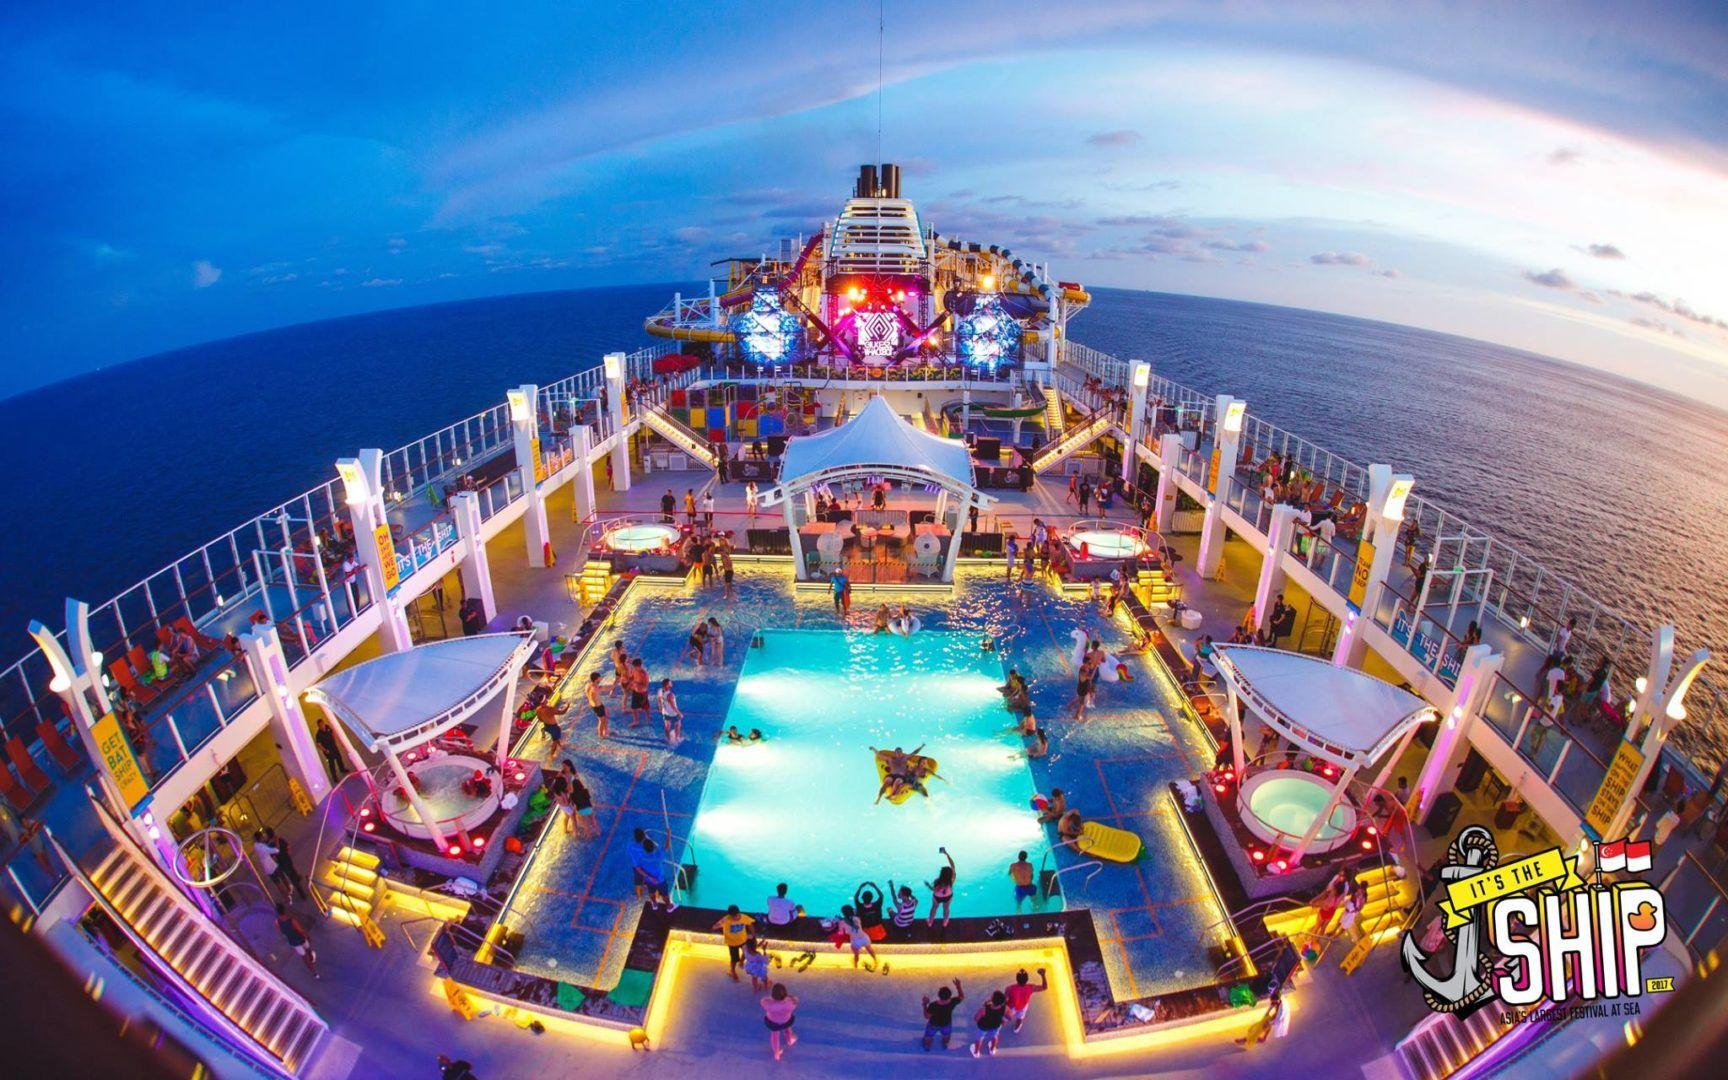 It's The Ship festivales caros